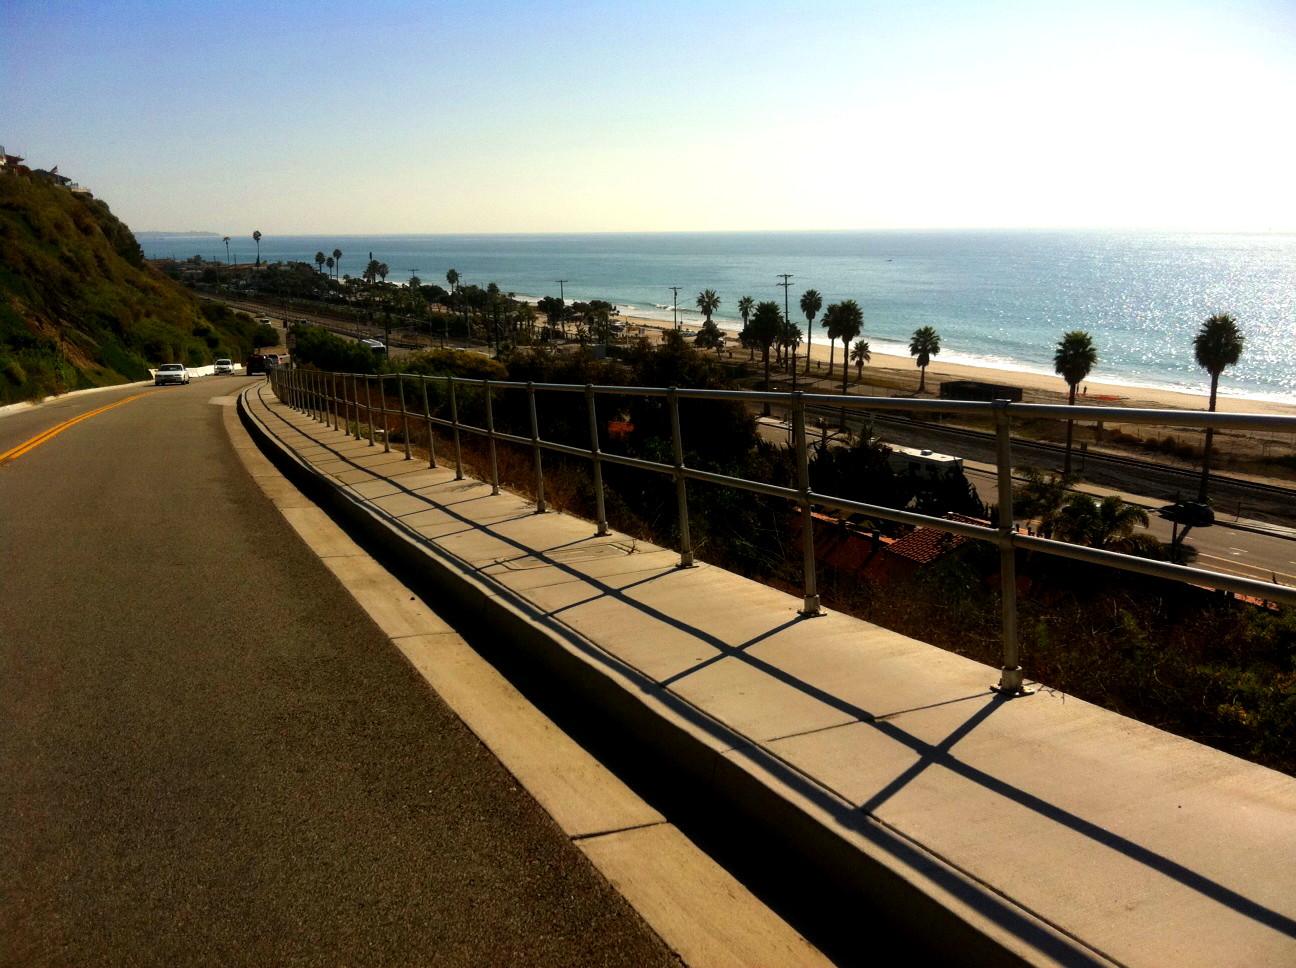 capistrano_beach_palisades_area_road